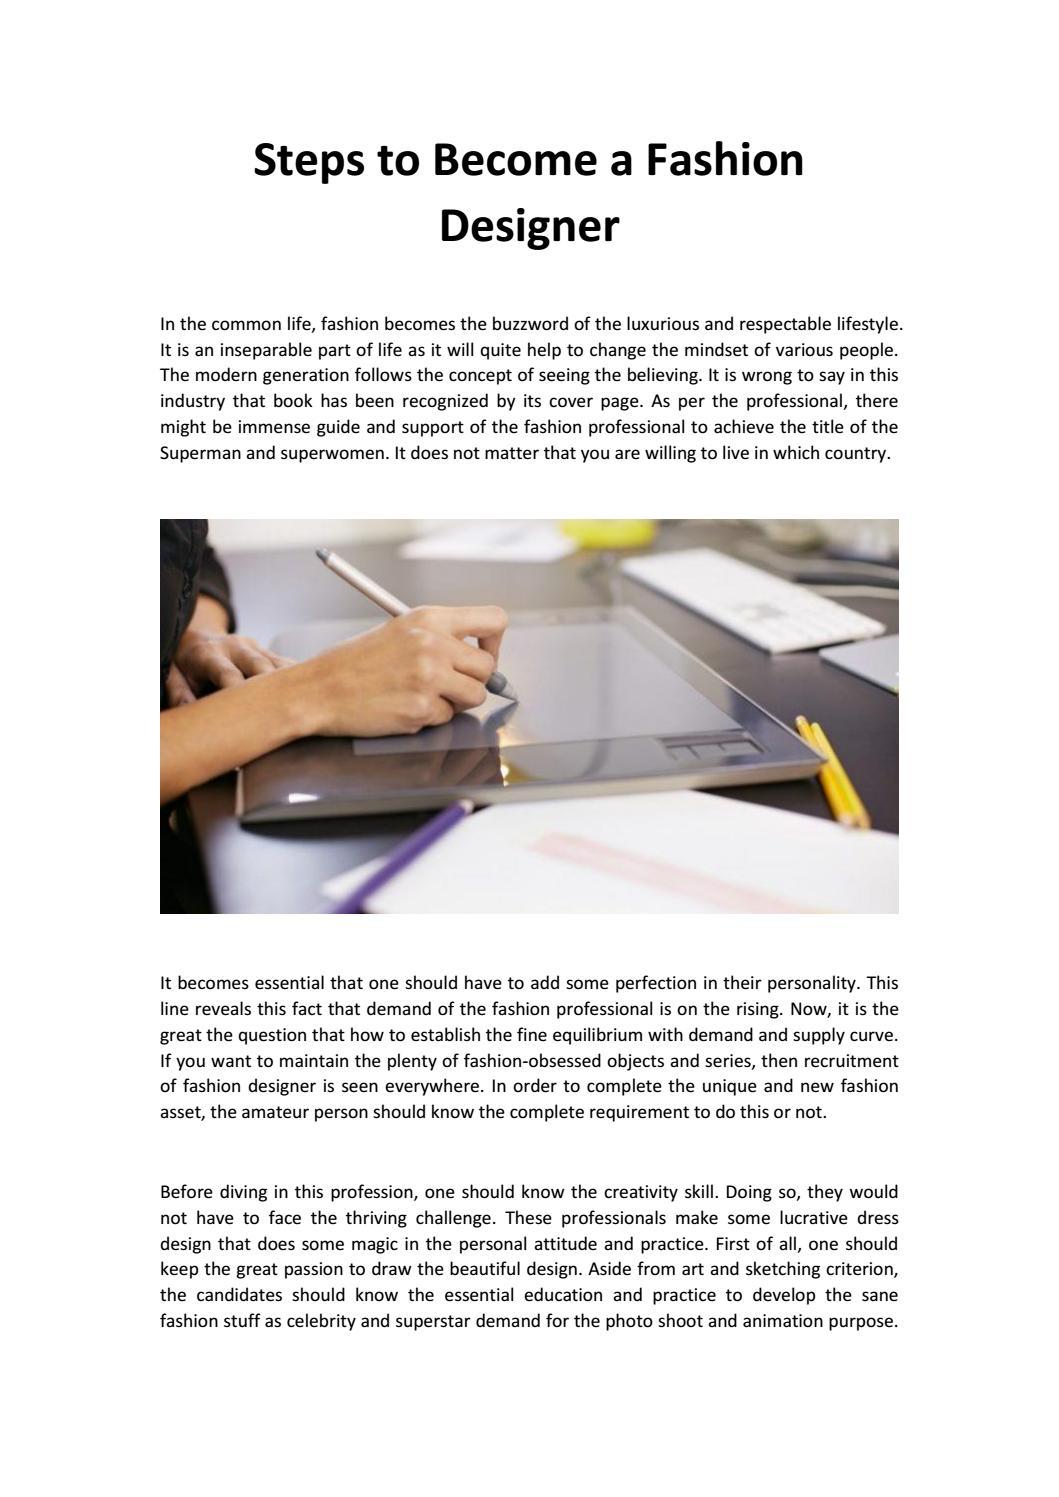 Steps To Become A Fashion Designer By Lisaadelhifashion Issuu